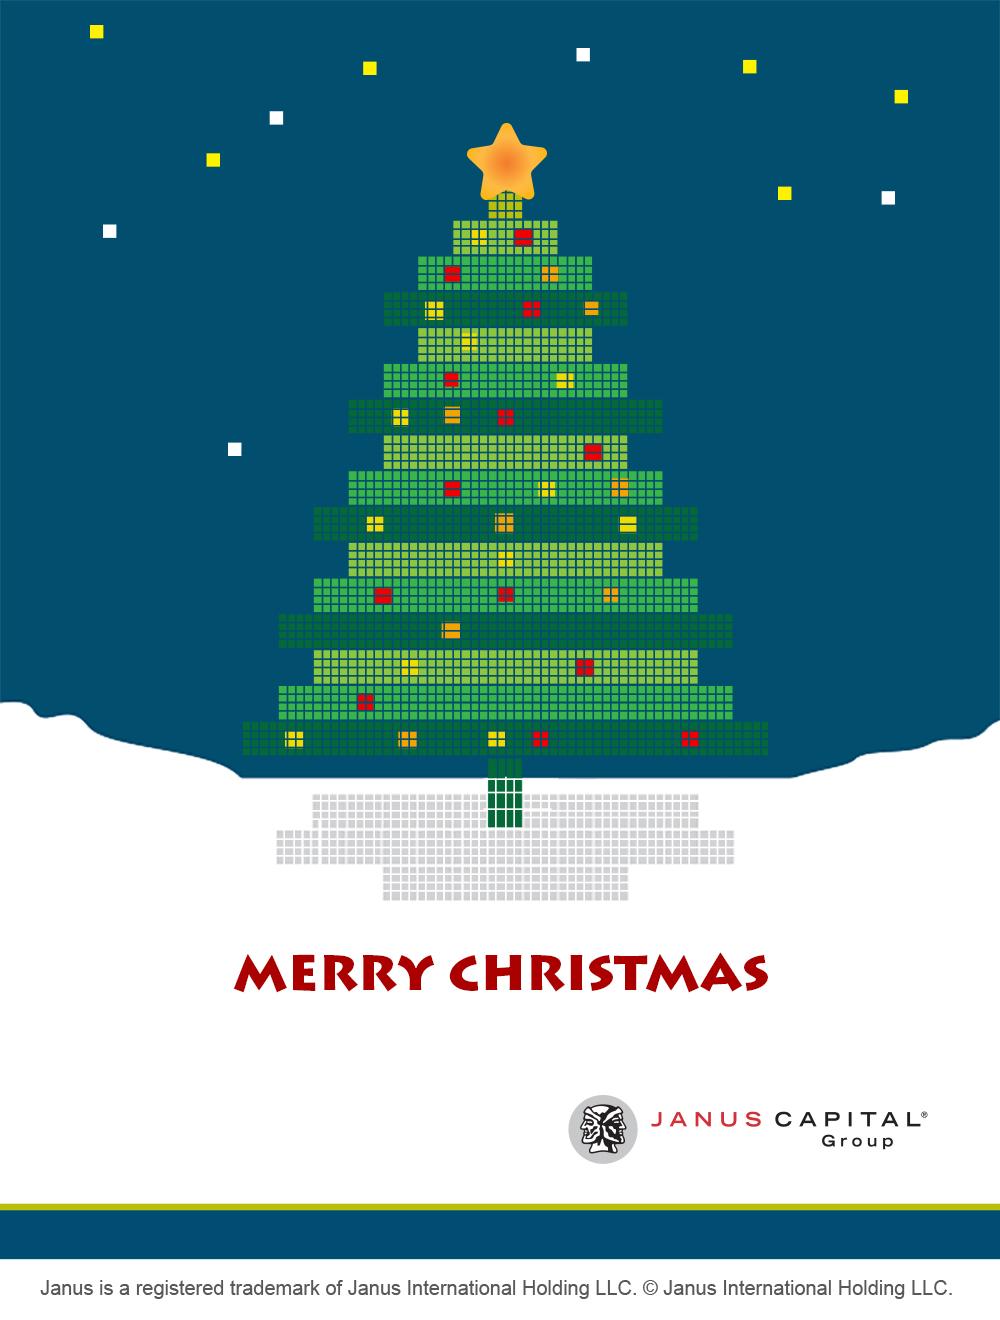 illustration - Christmas card design for Janus Capital